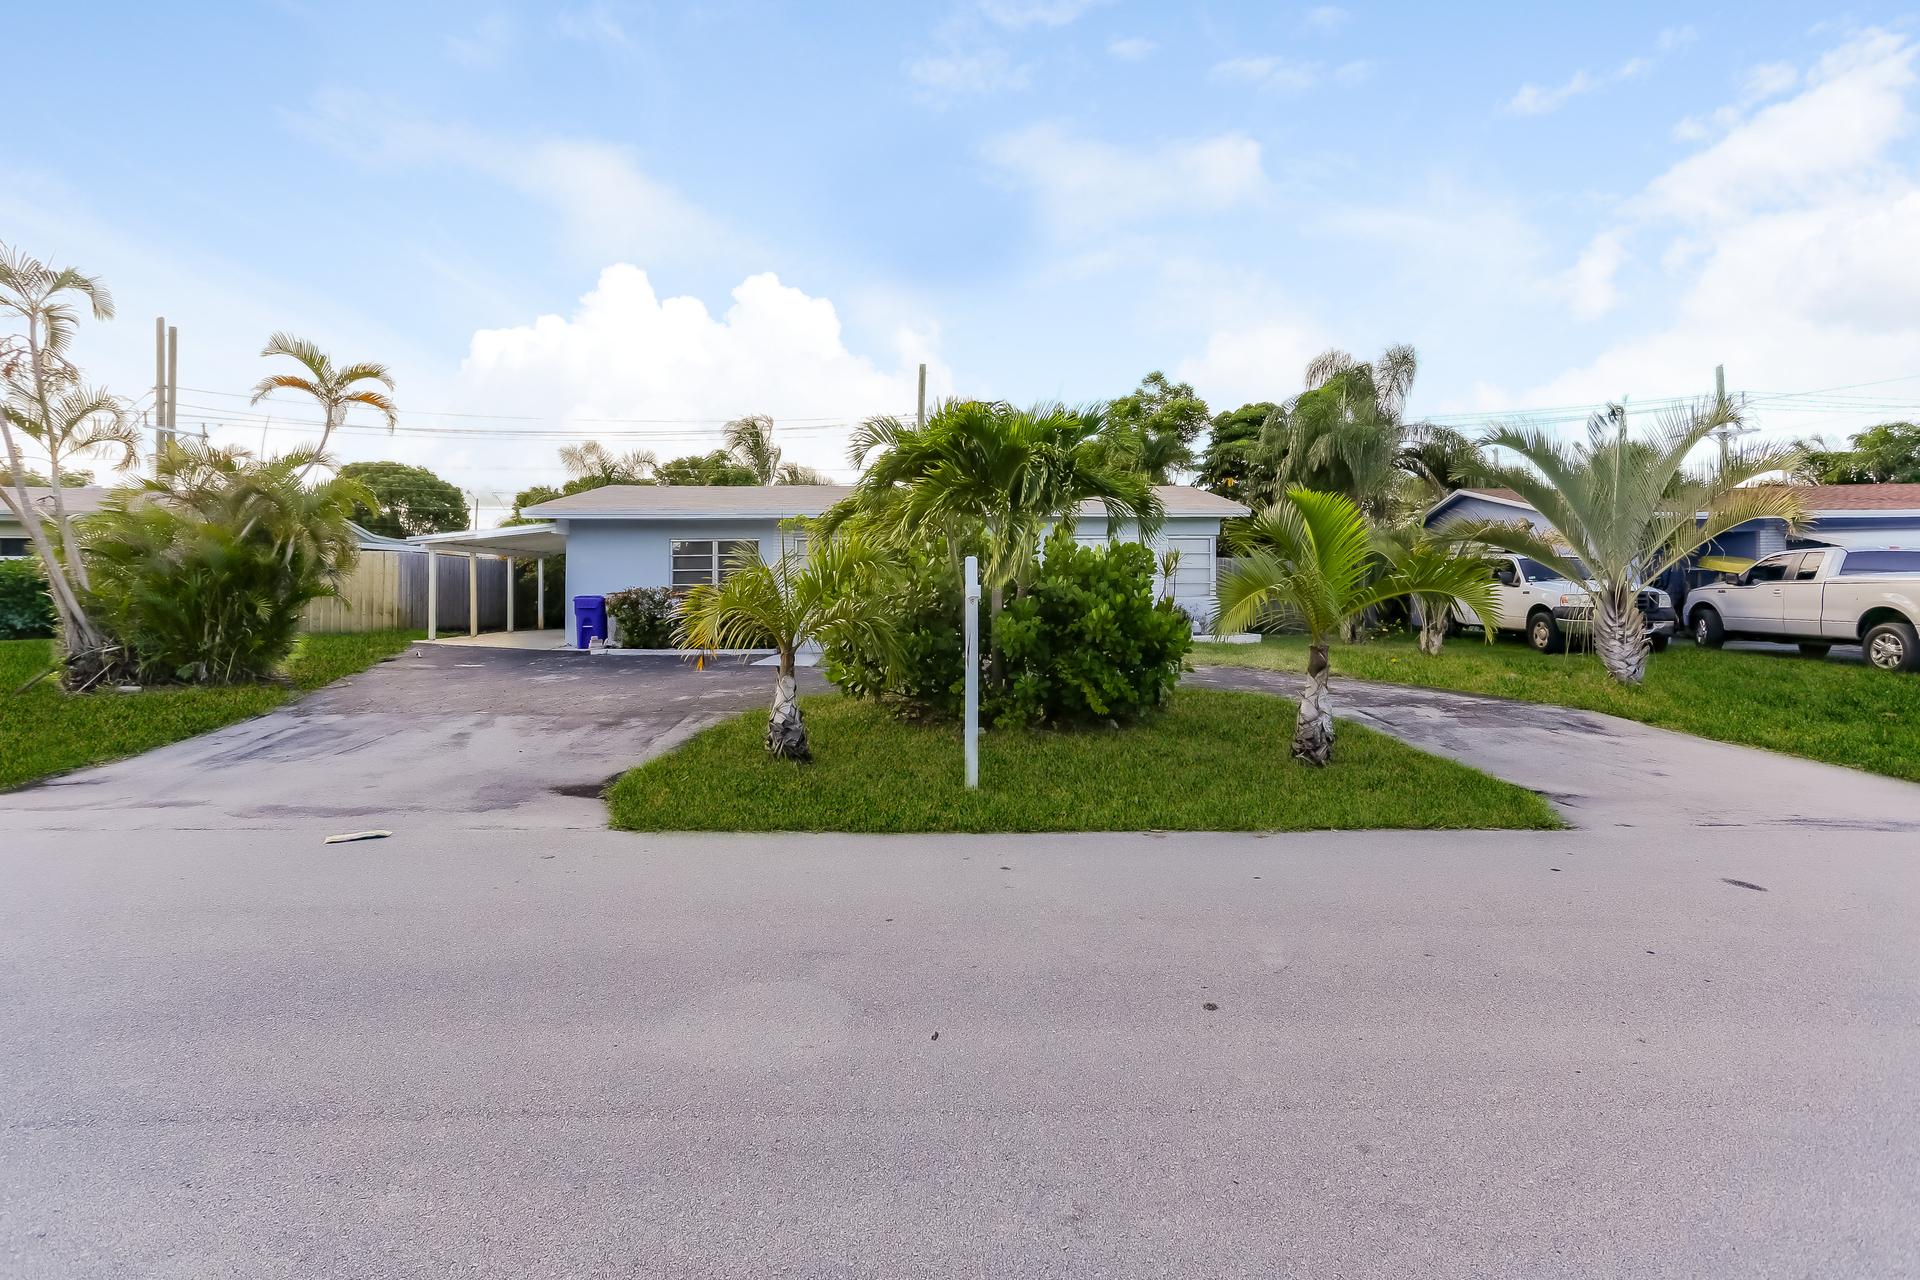 Photo of 1441 NE 32nd Pl, Pompano Beach, FL, 33064